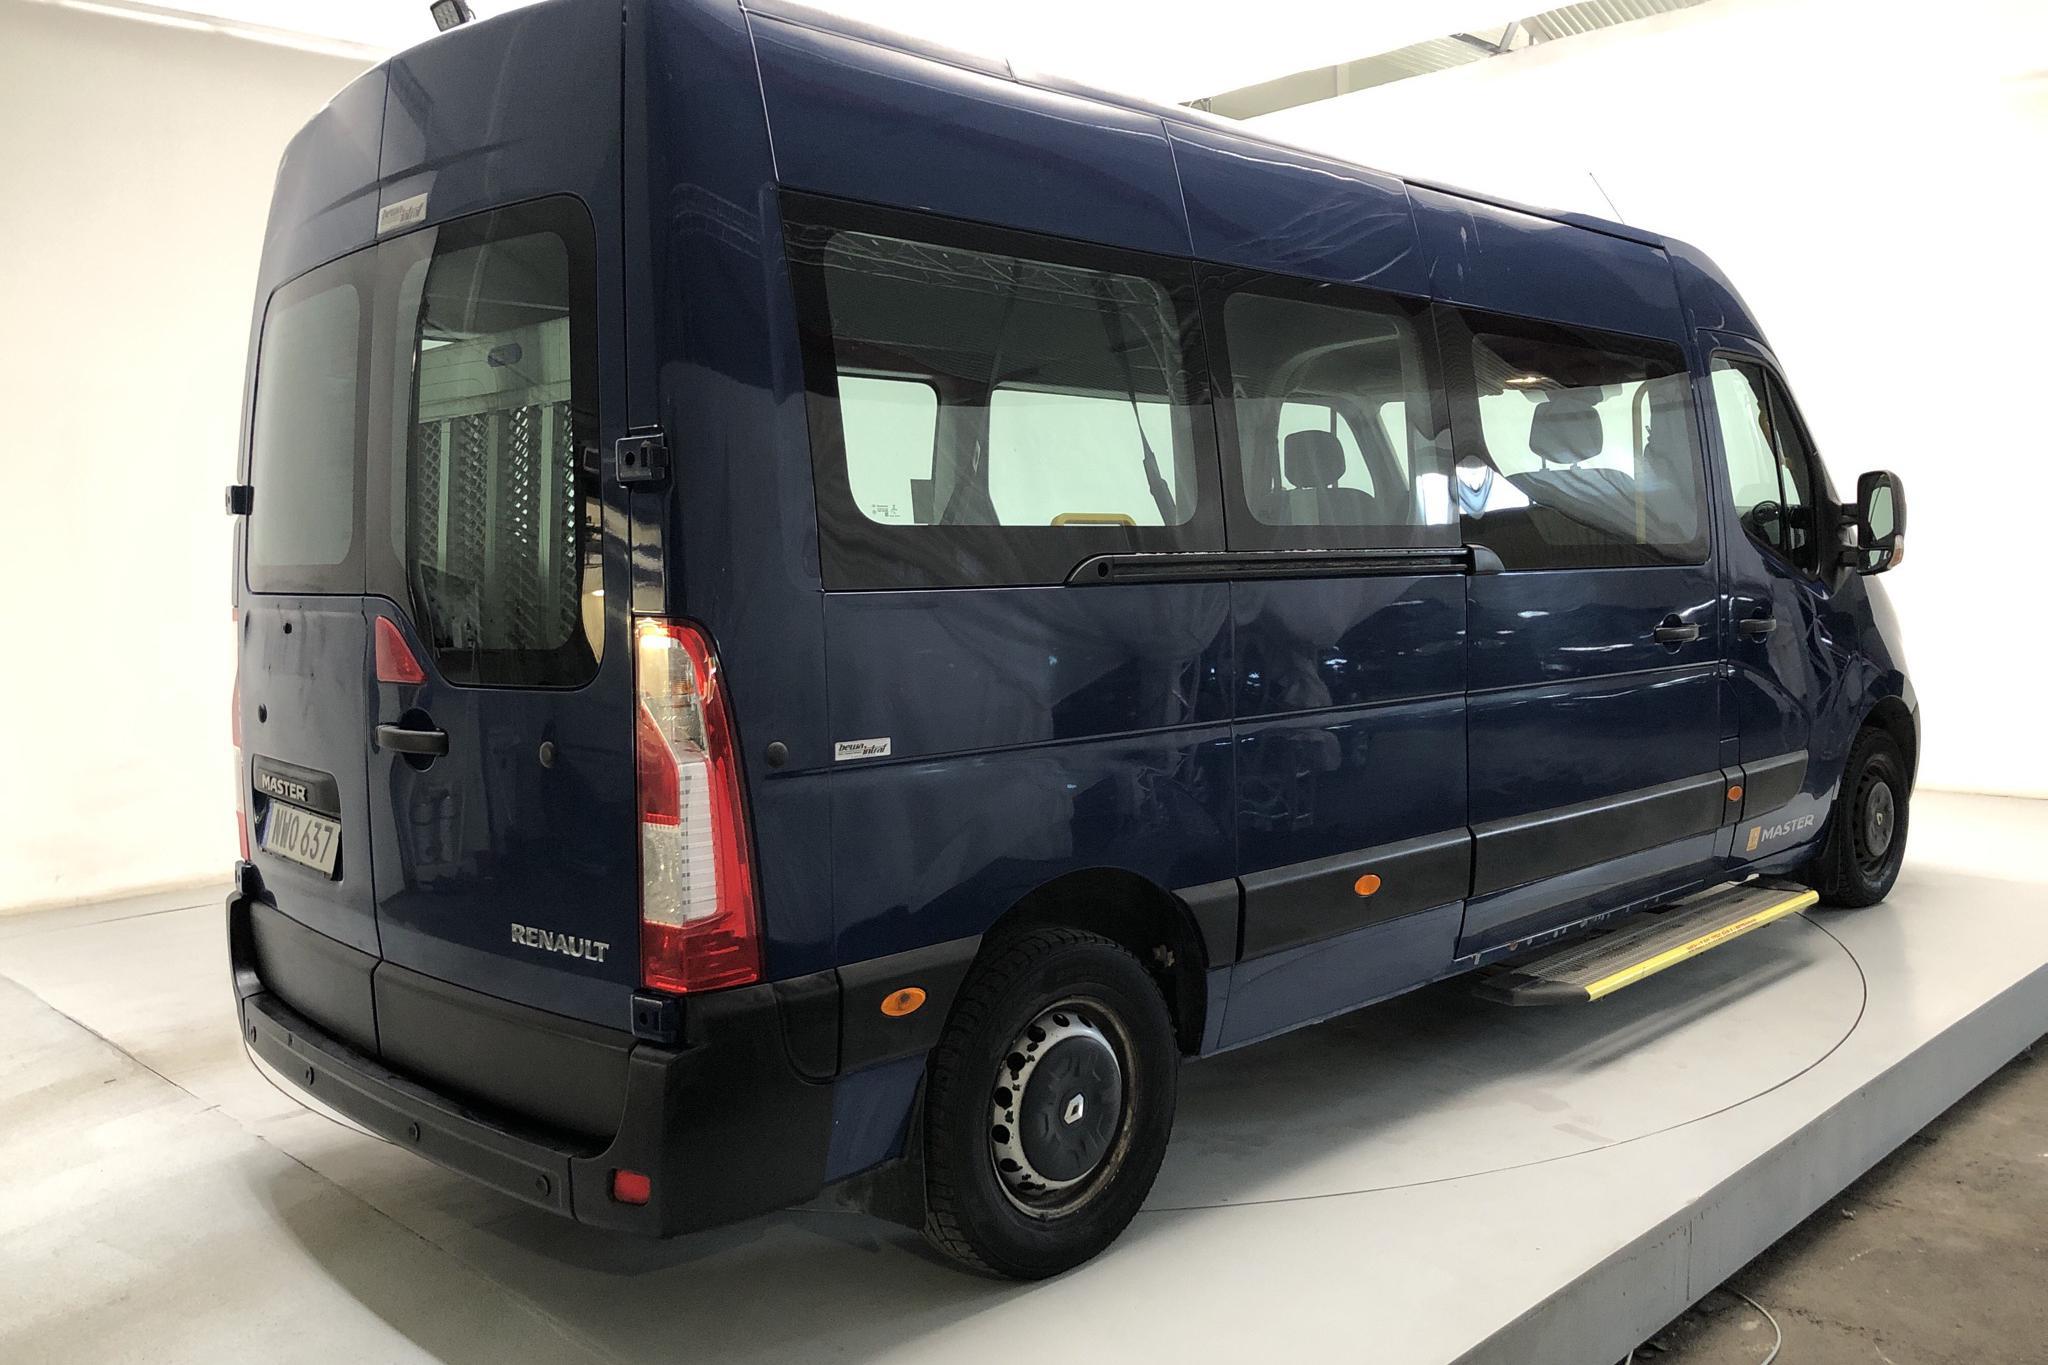 Renault Master MPV 2.3 dCi 2WD (145hk) - 358 910 km - Manual - Dark Blue - 2016